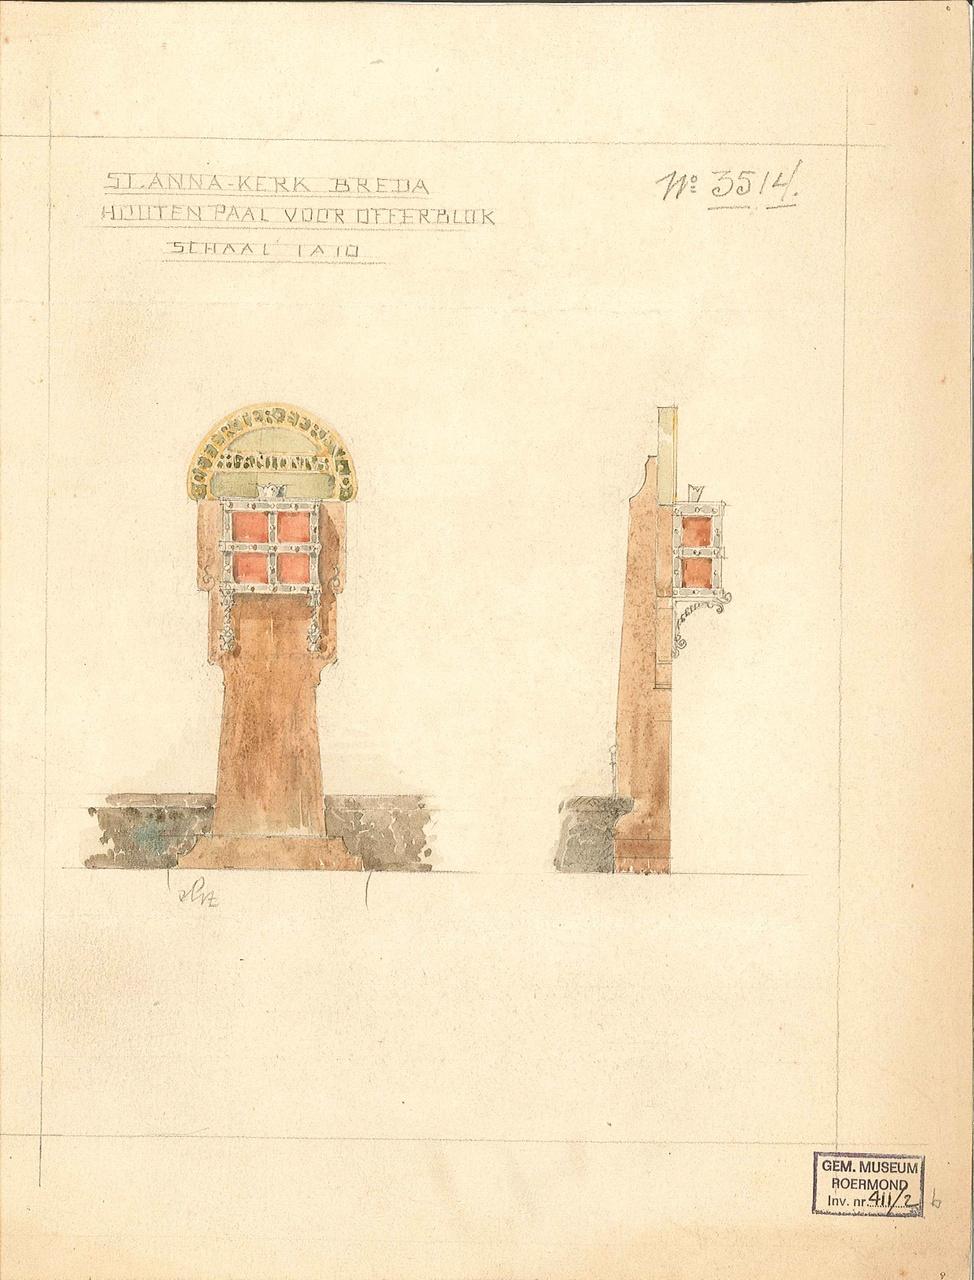 St. Annakerk Breda, houten paal voor offerblok